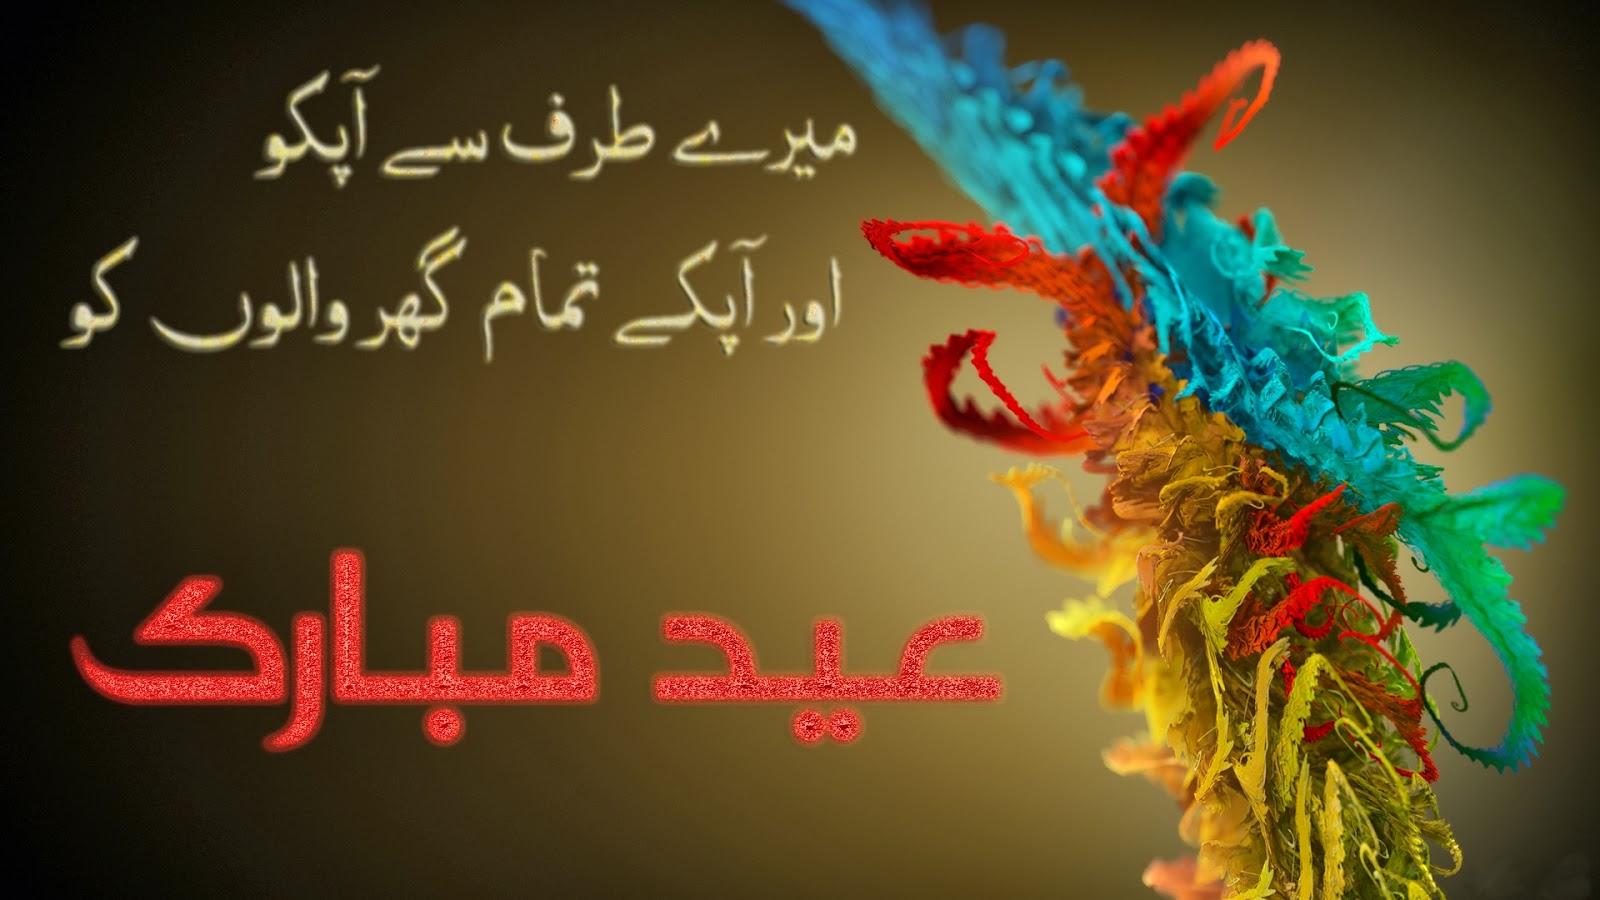 free eid ul adha mubarak greetings cards eid mubarak ecards